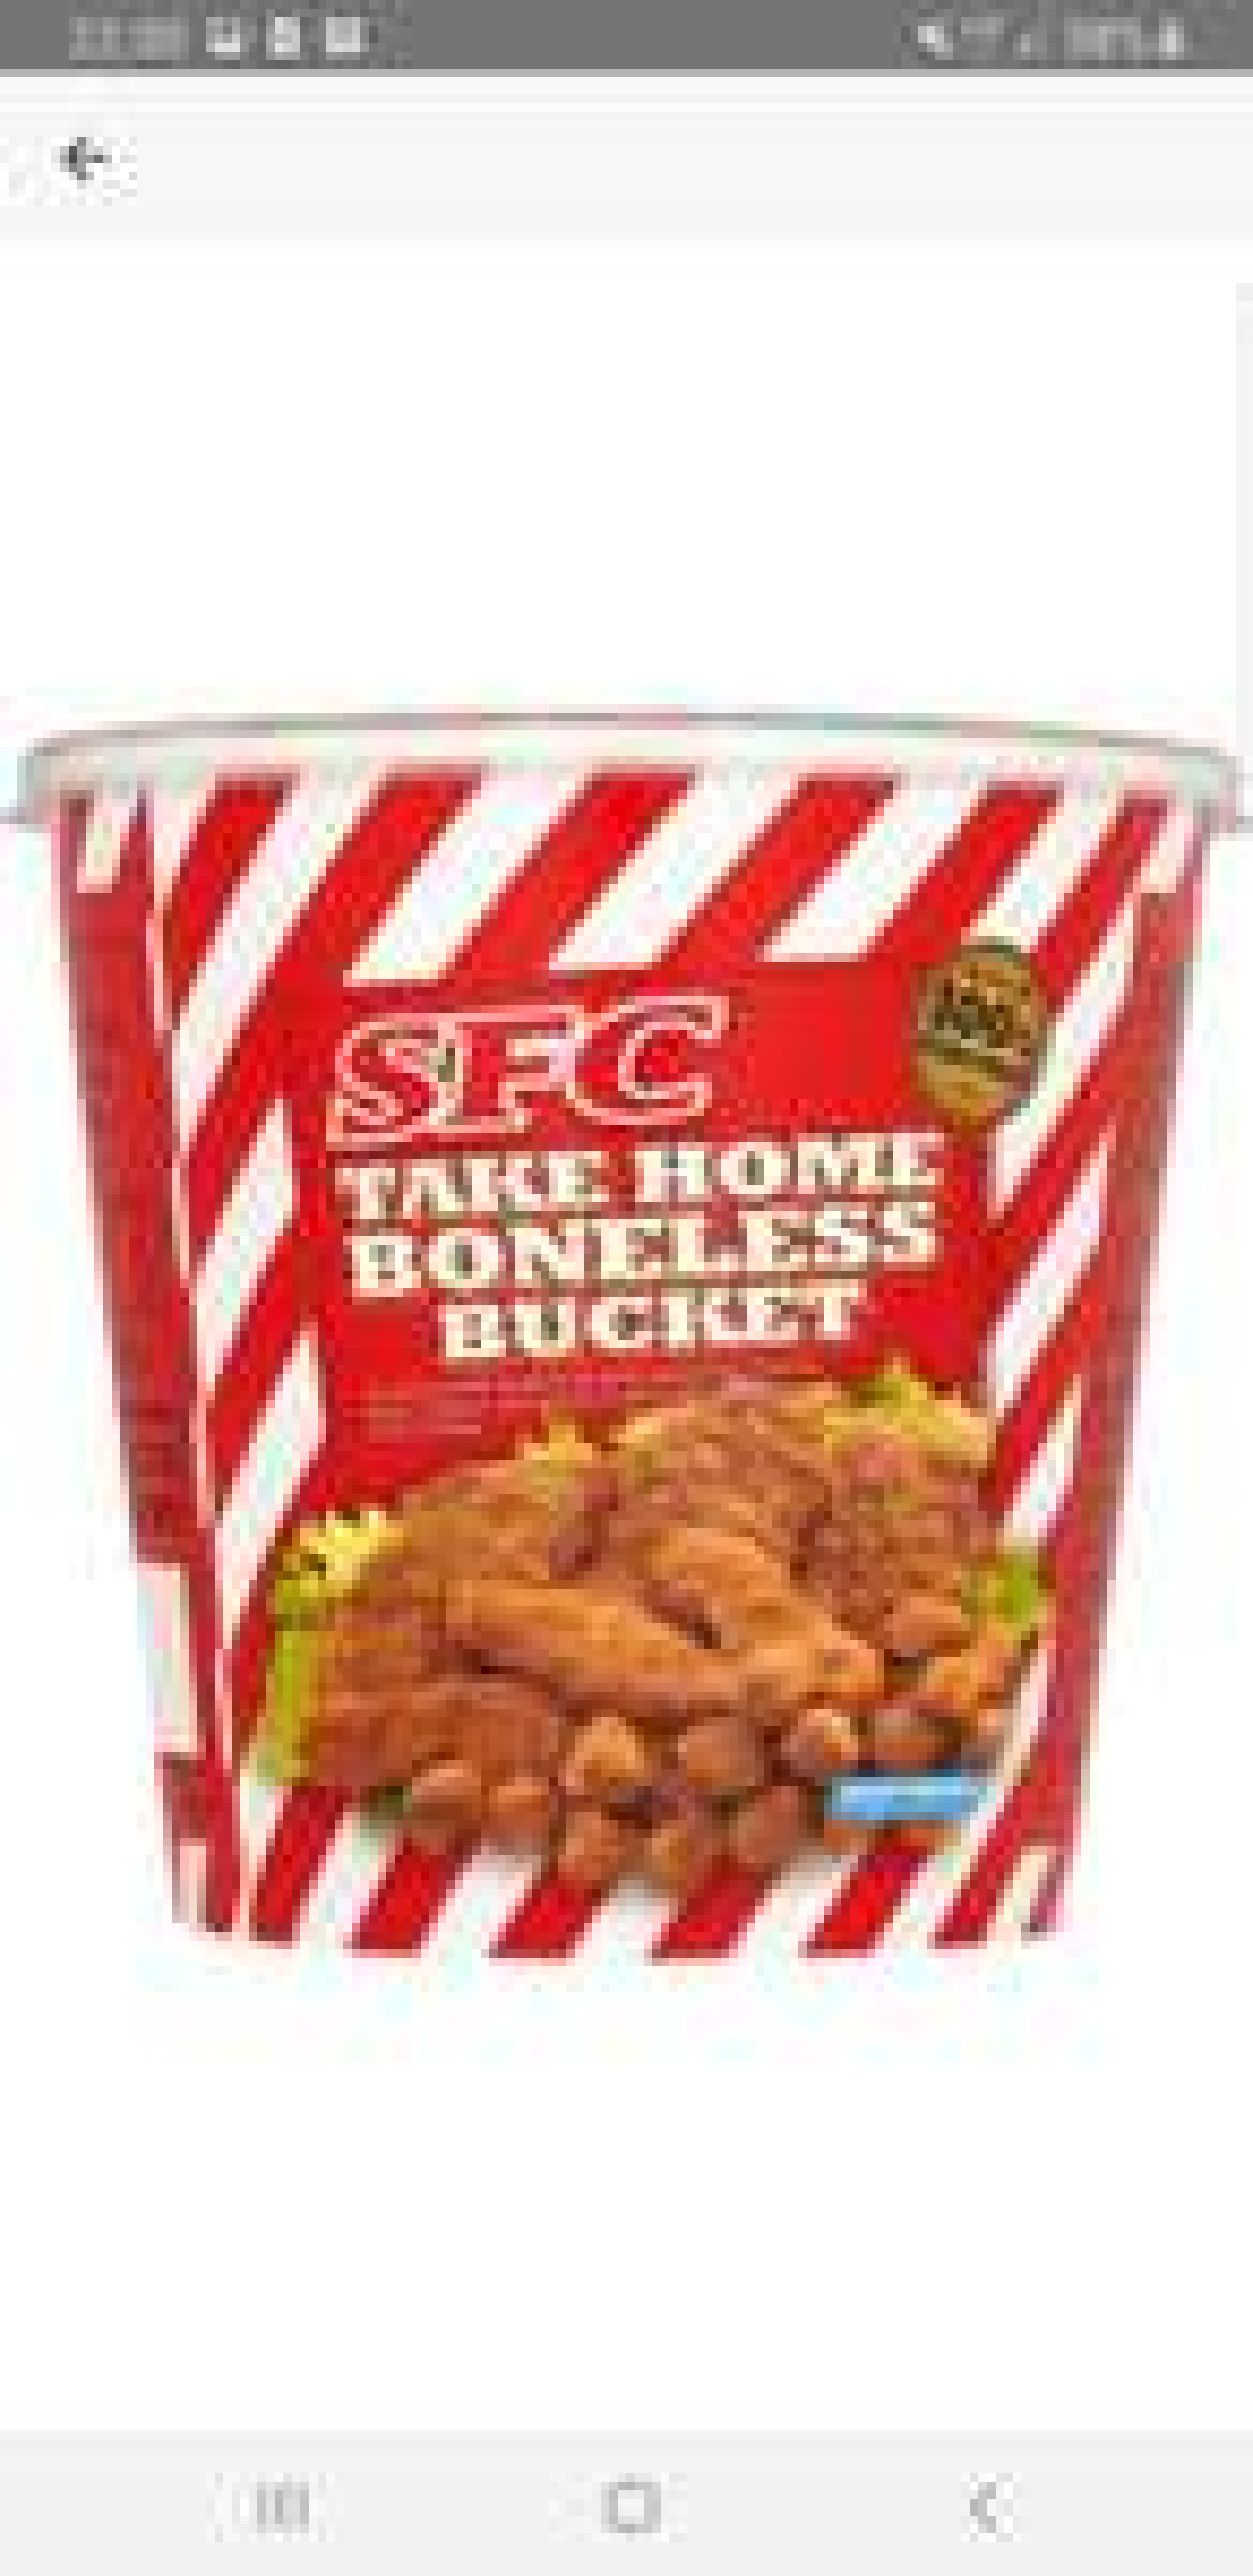 SFC Chicken Boneless Bucket 650g @ Lidl Instore & advertised Online - 99p